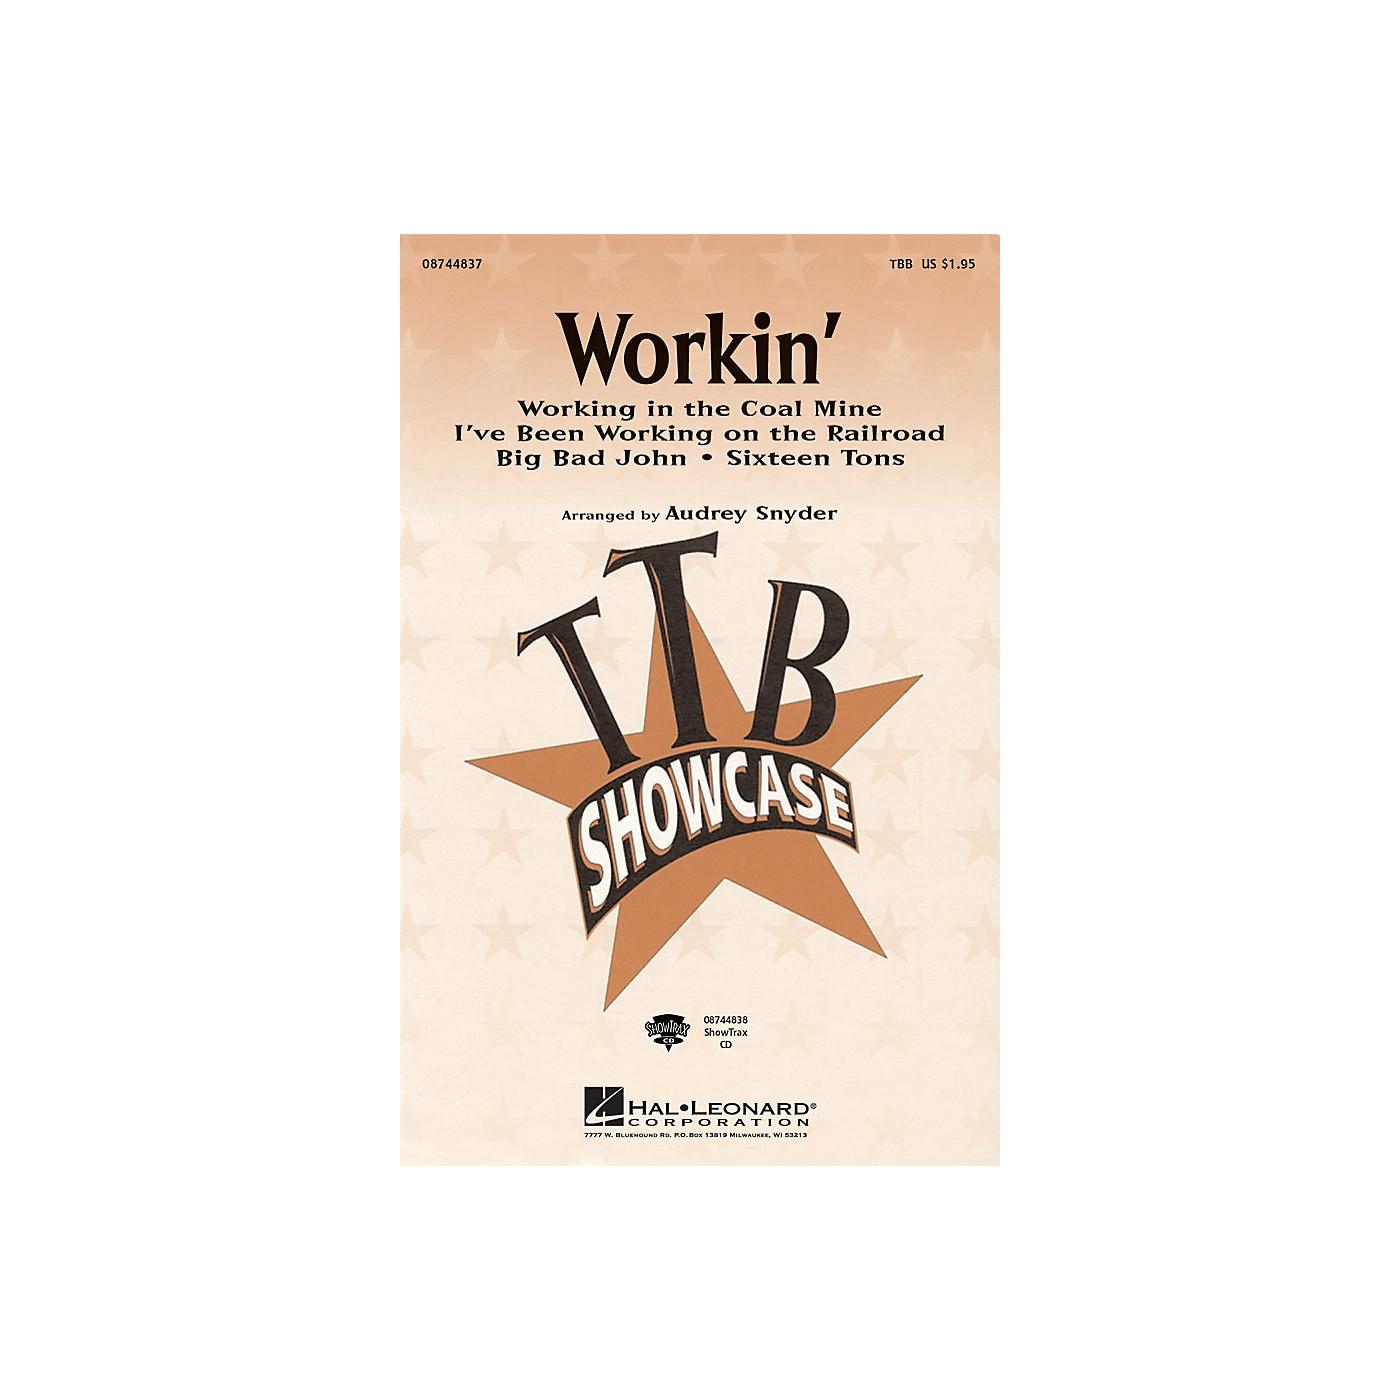 Hal Leonard Workin' (Medley) TBB arranged by Audrey Snyder thumbnail